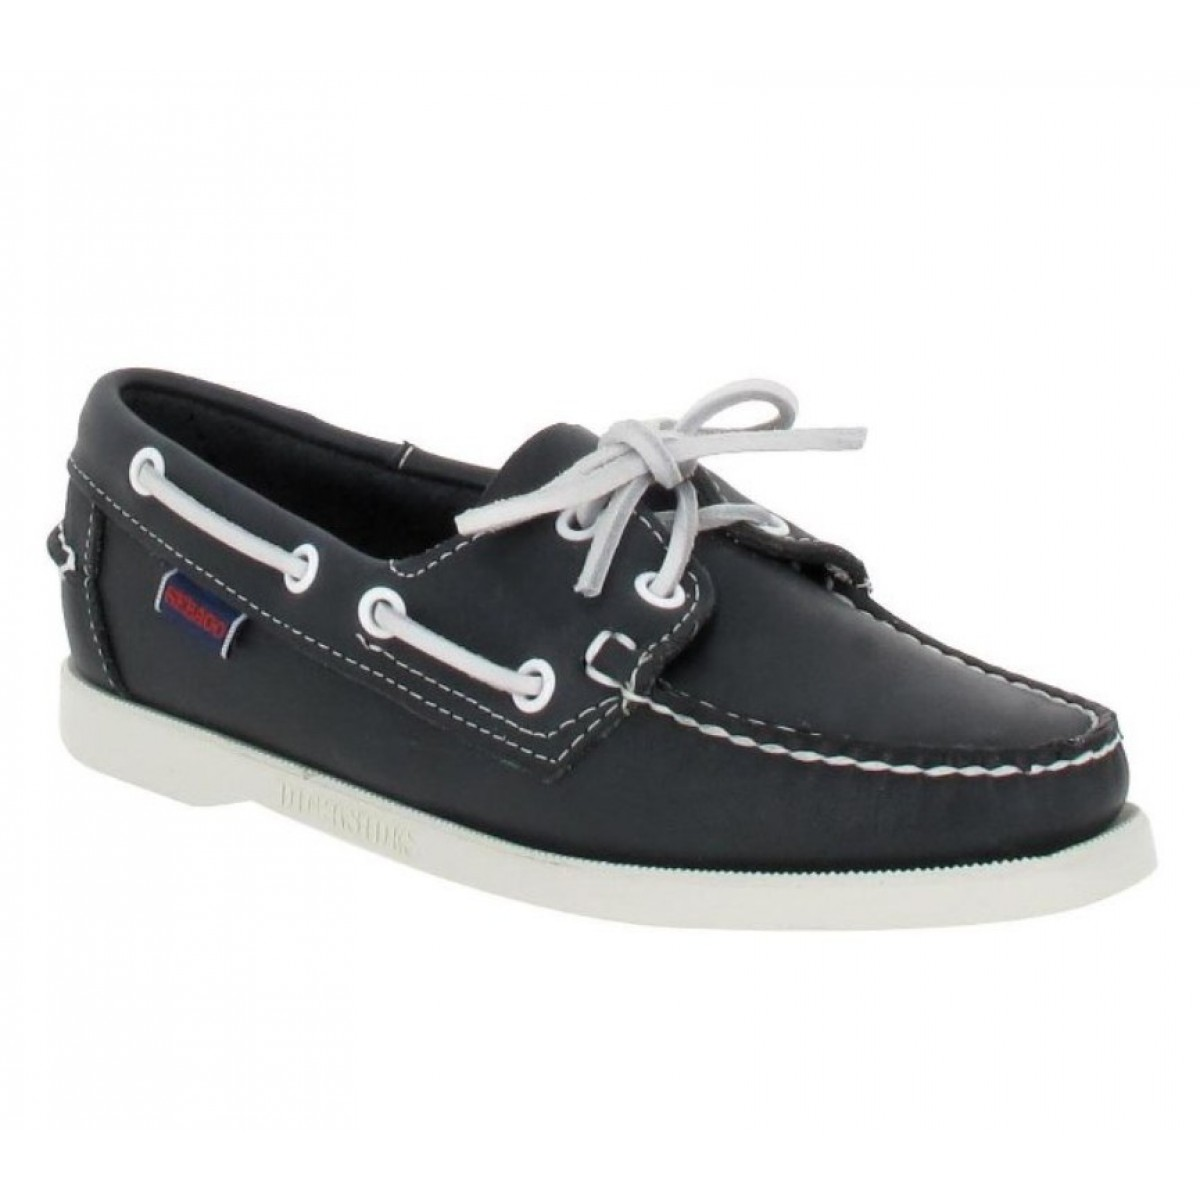 Chaussures bateaux SEBAGO Docksides Femme Marine